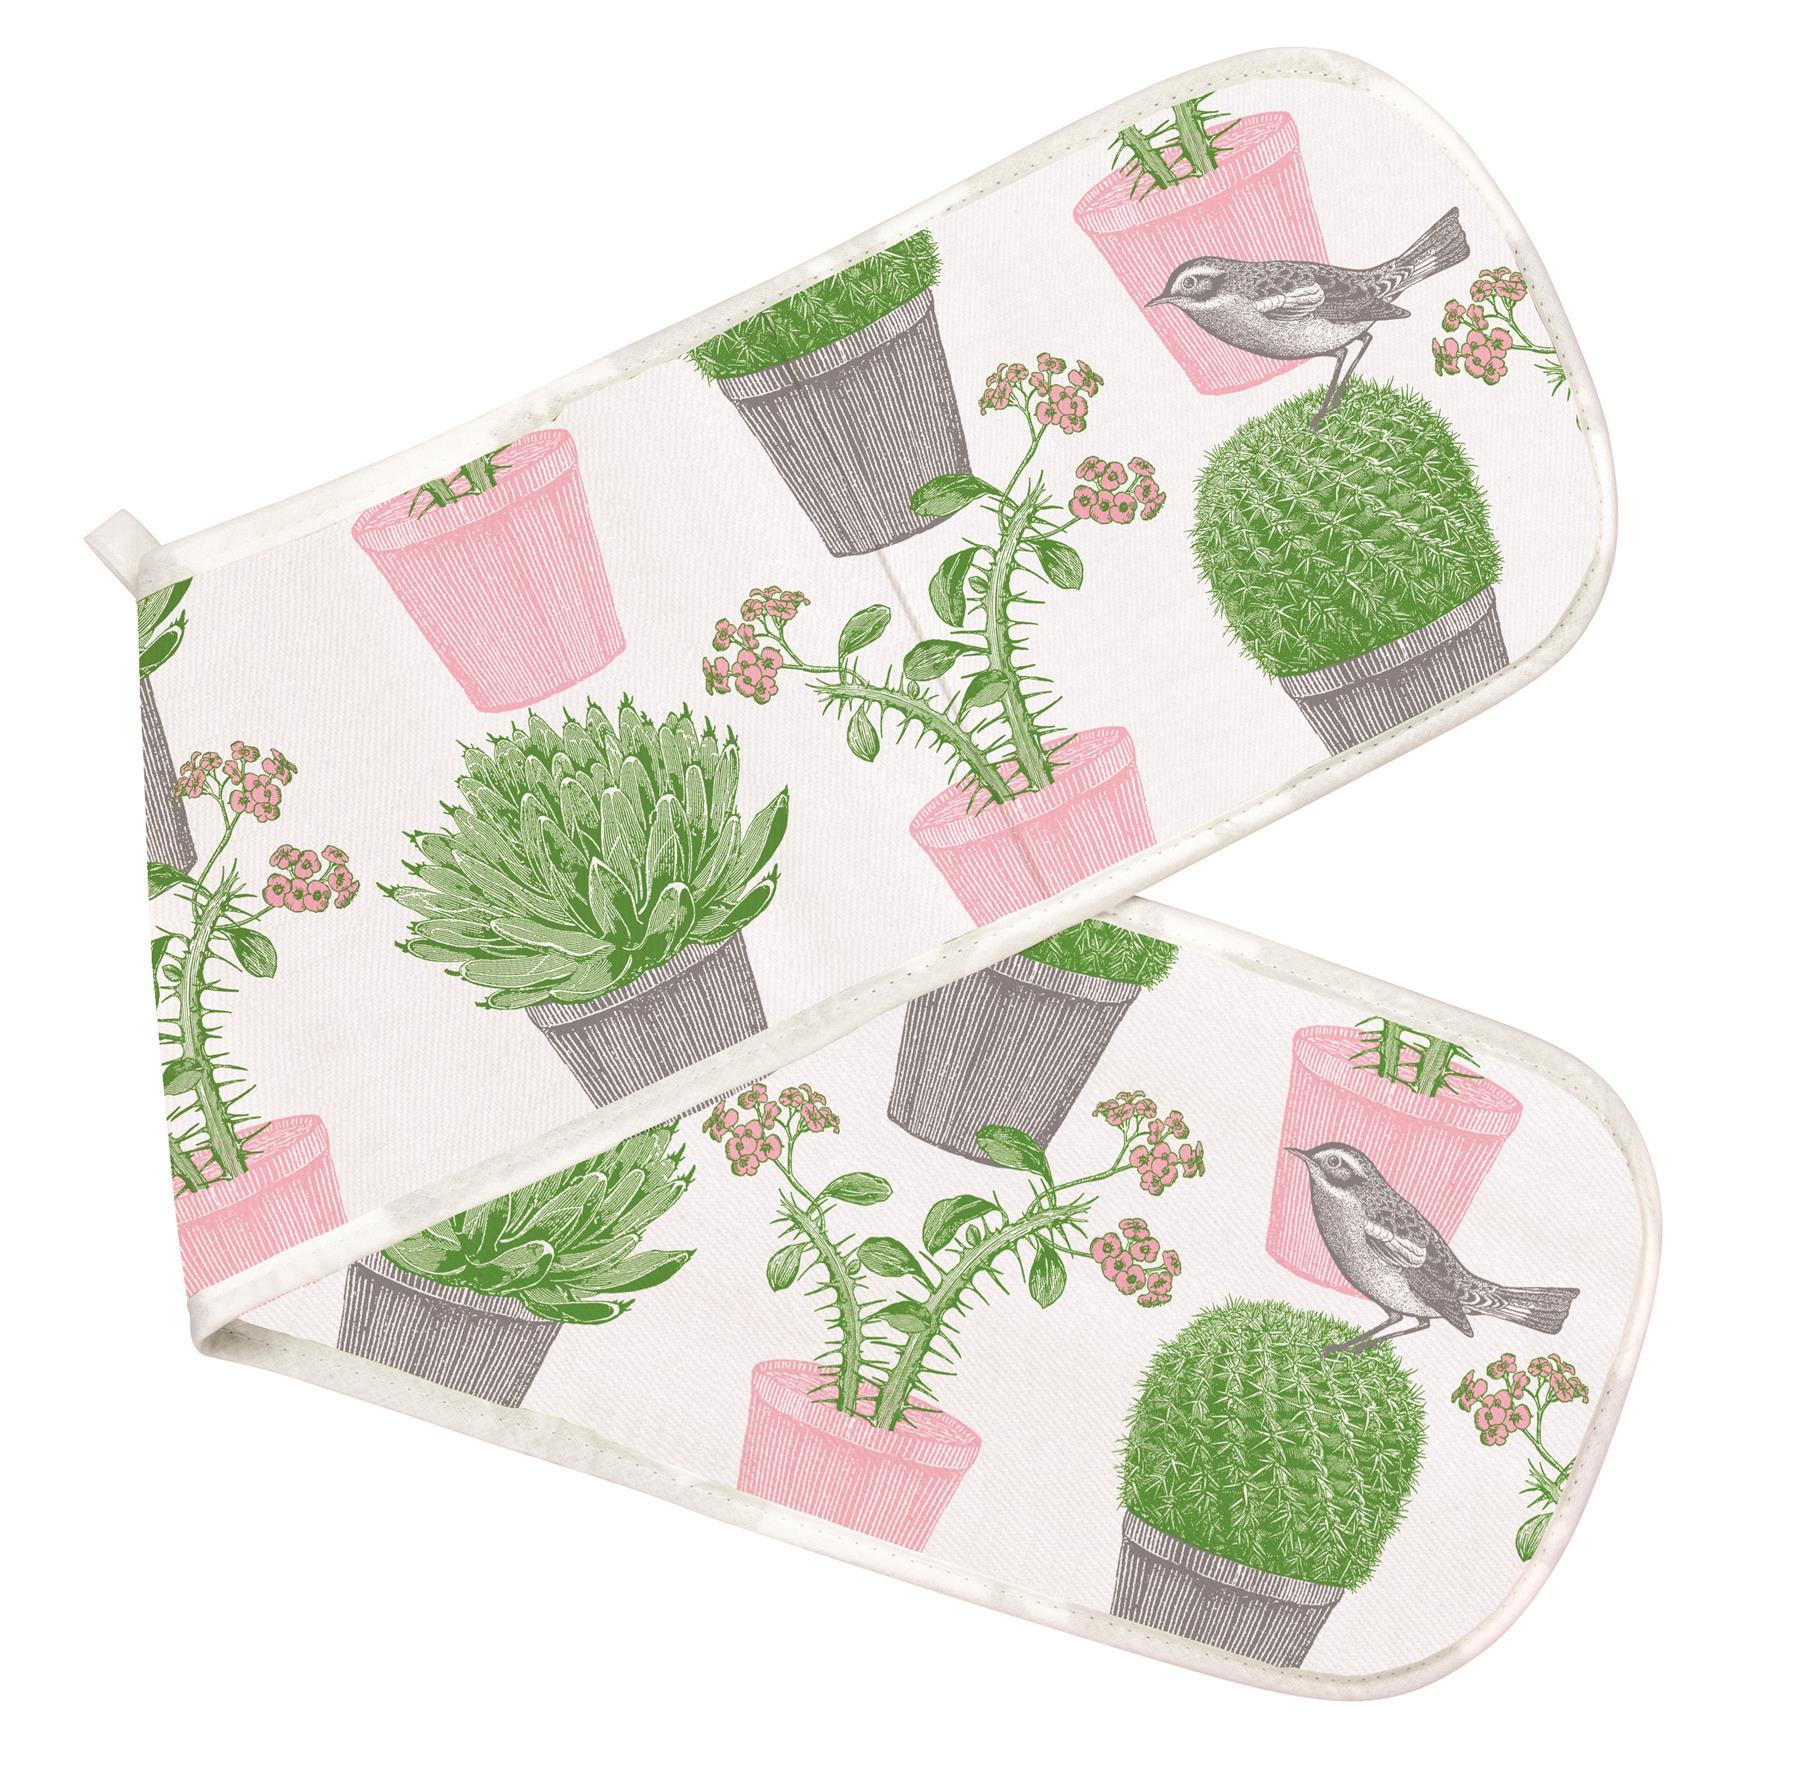 Thornback /& Peel 100/% Cotton Double Oven Glove//Mitt Pink Jelly /& Cake